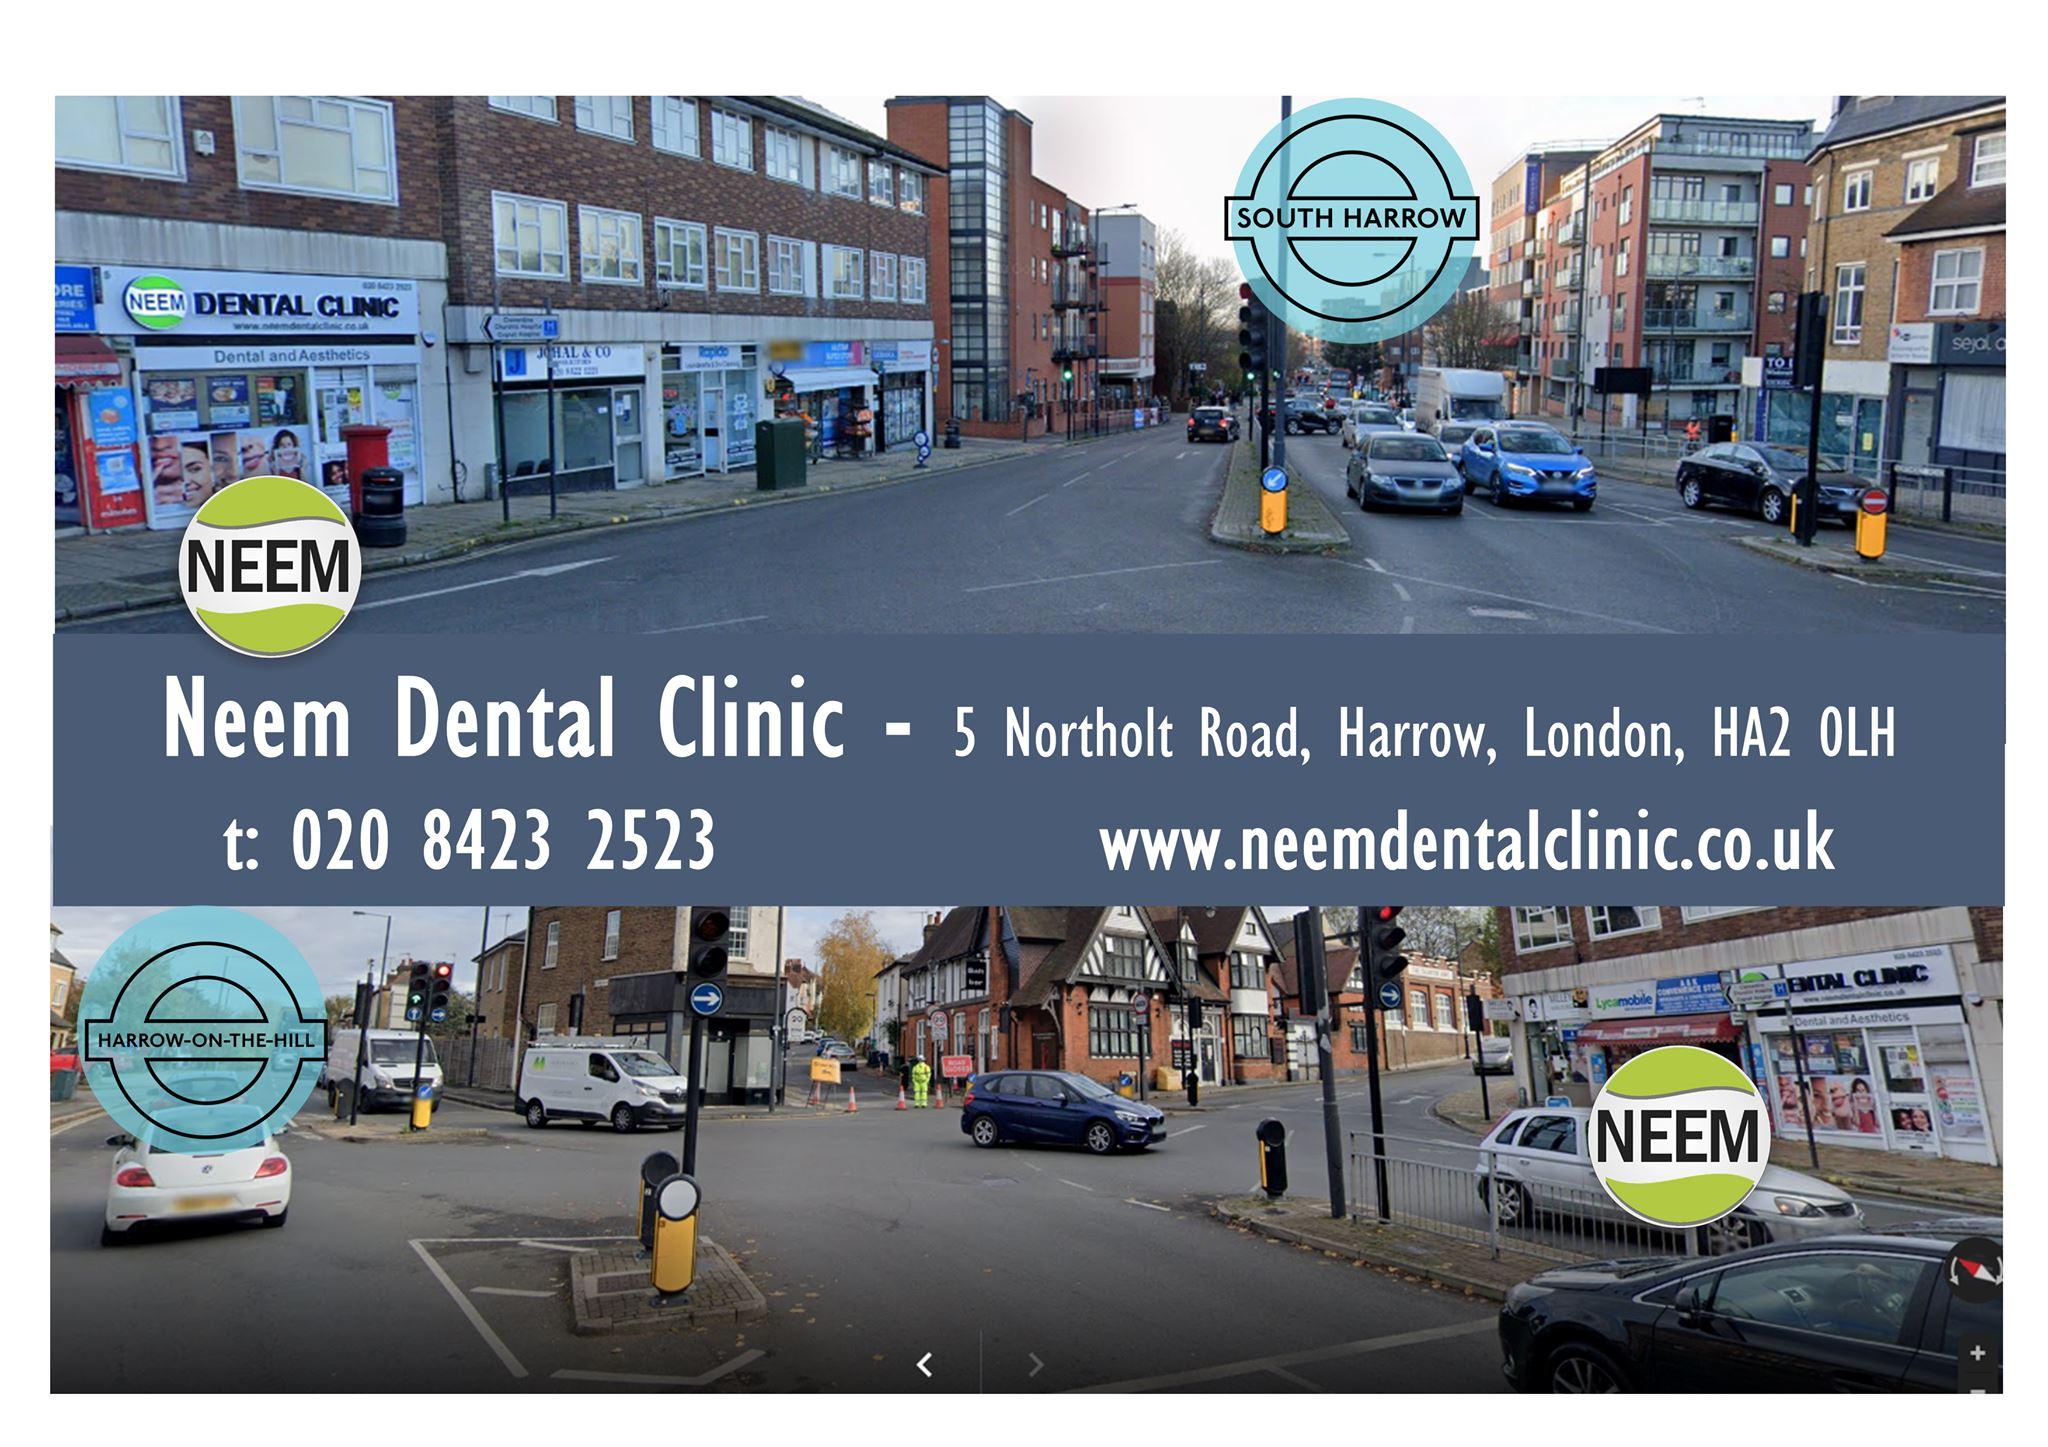 Dentist Harrow | Dental Clinic Harrow on Hill | Cosmetic Dentist South Harrow | Emergency Dentist Harrow | Neem Dental Clinic